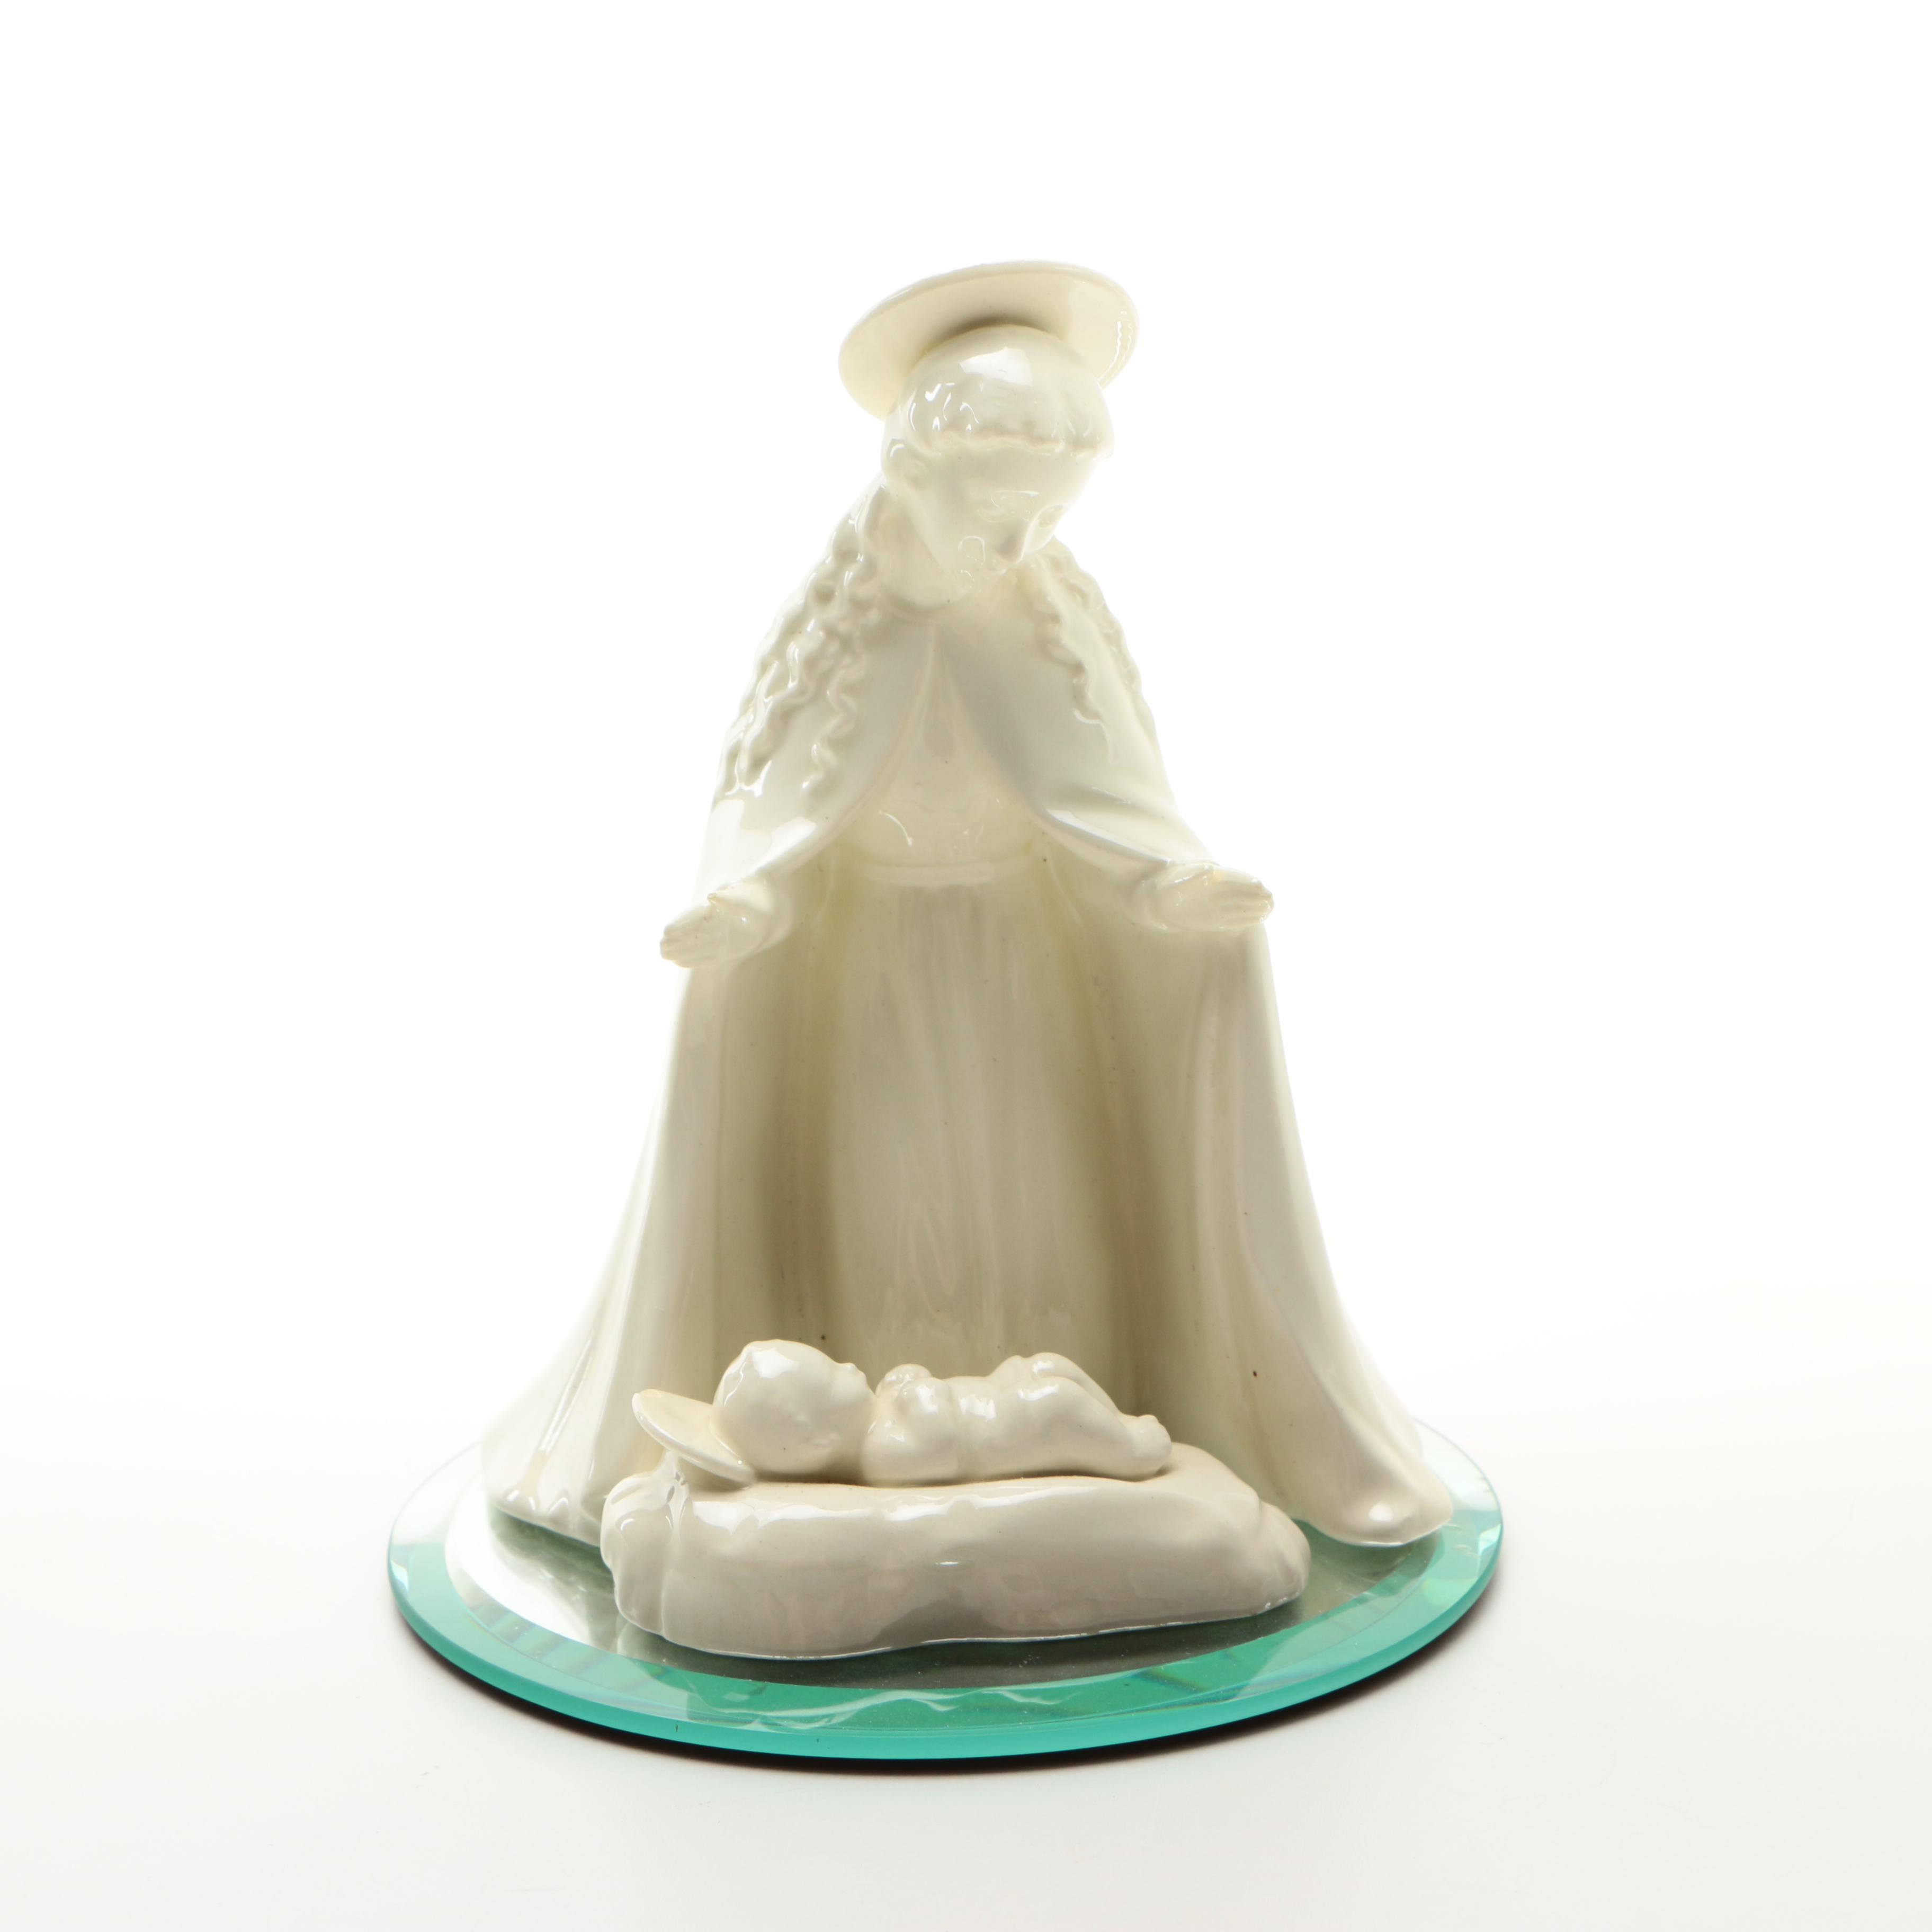 Vintage Hummel White Overglaze Nativity Figurines